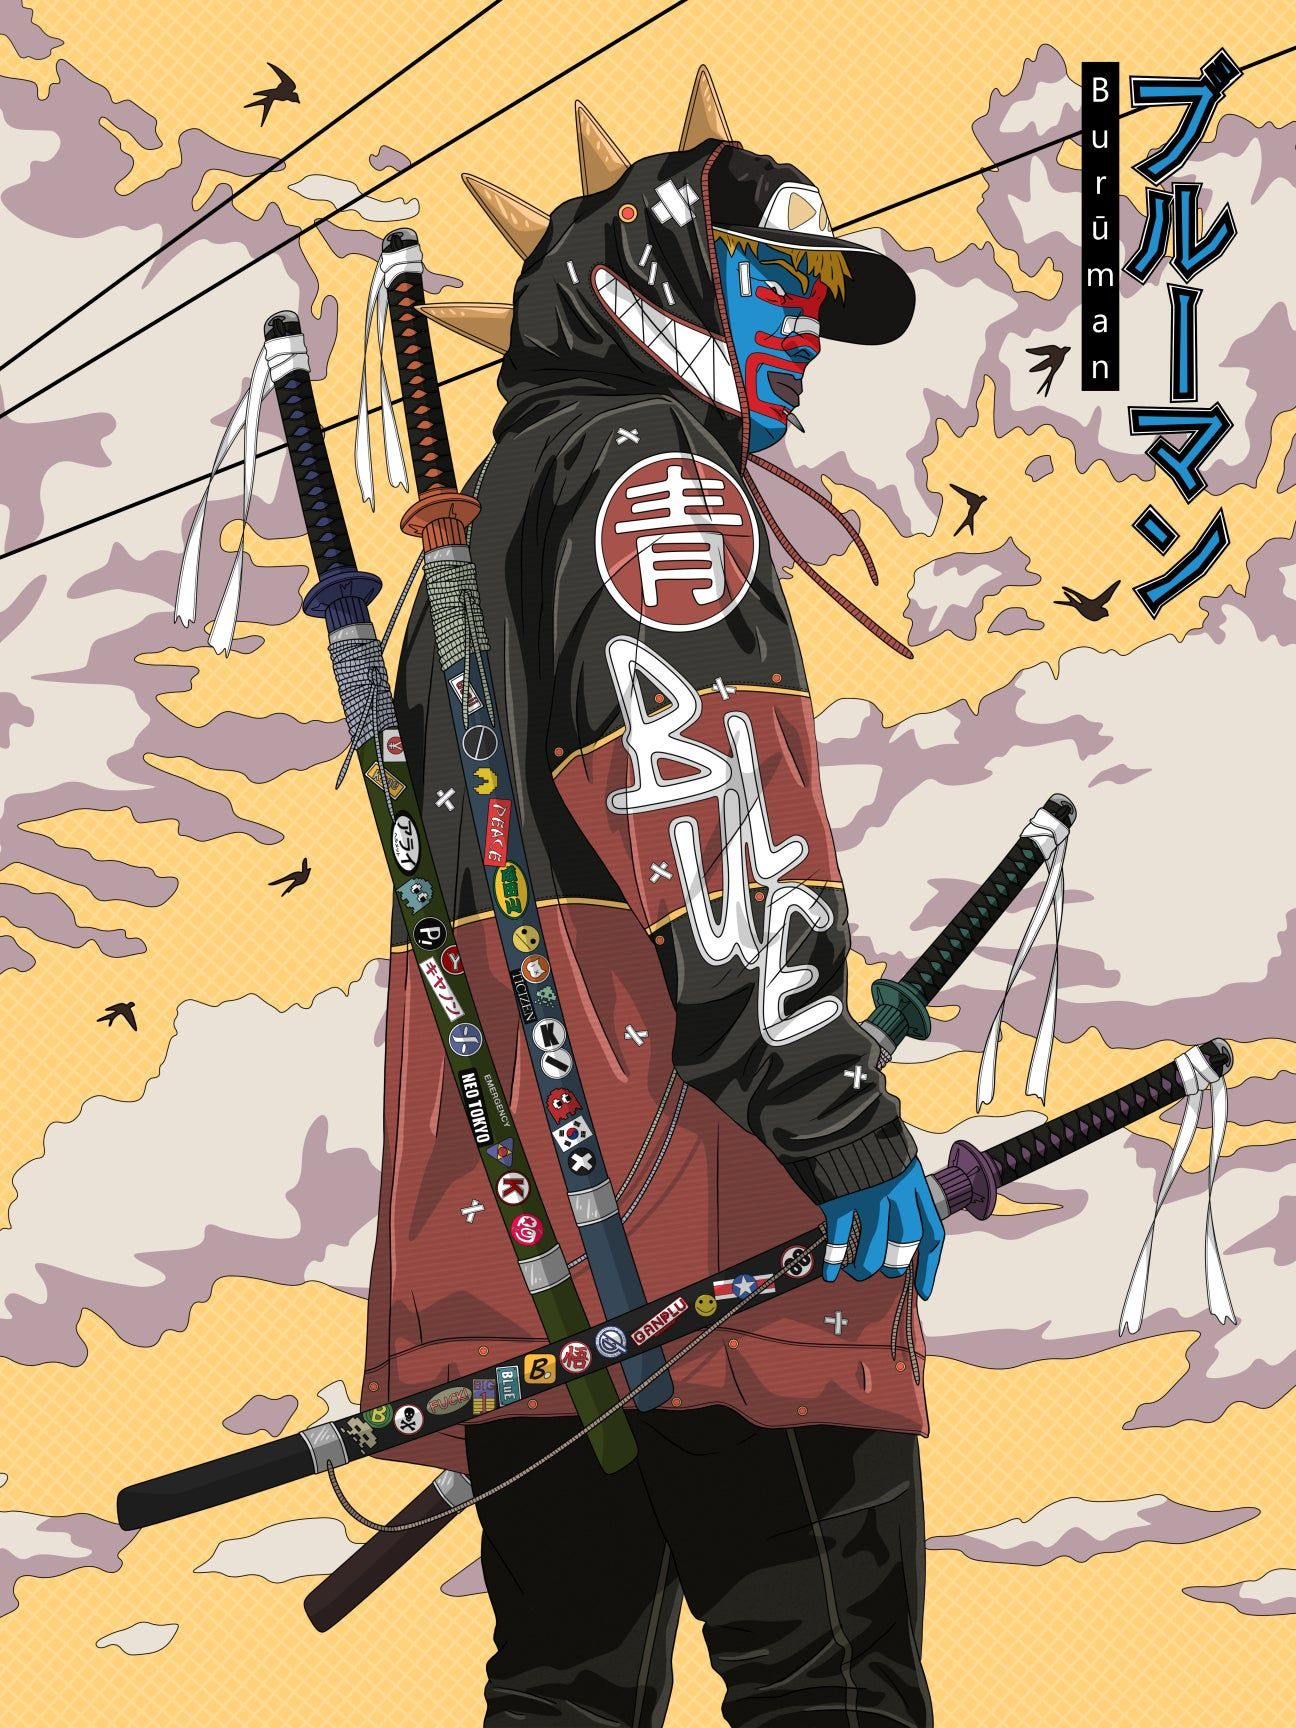 Urban Samurai 2020 Buruman Series I P Lobato In 2020 Samurai Artwork Samurai Art Concept Art Characters